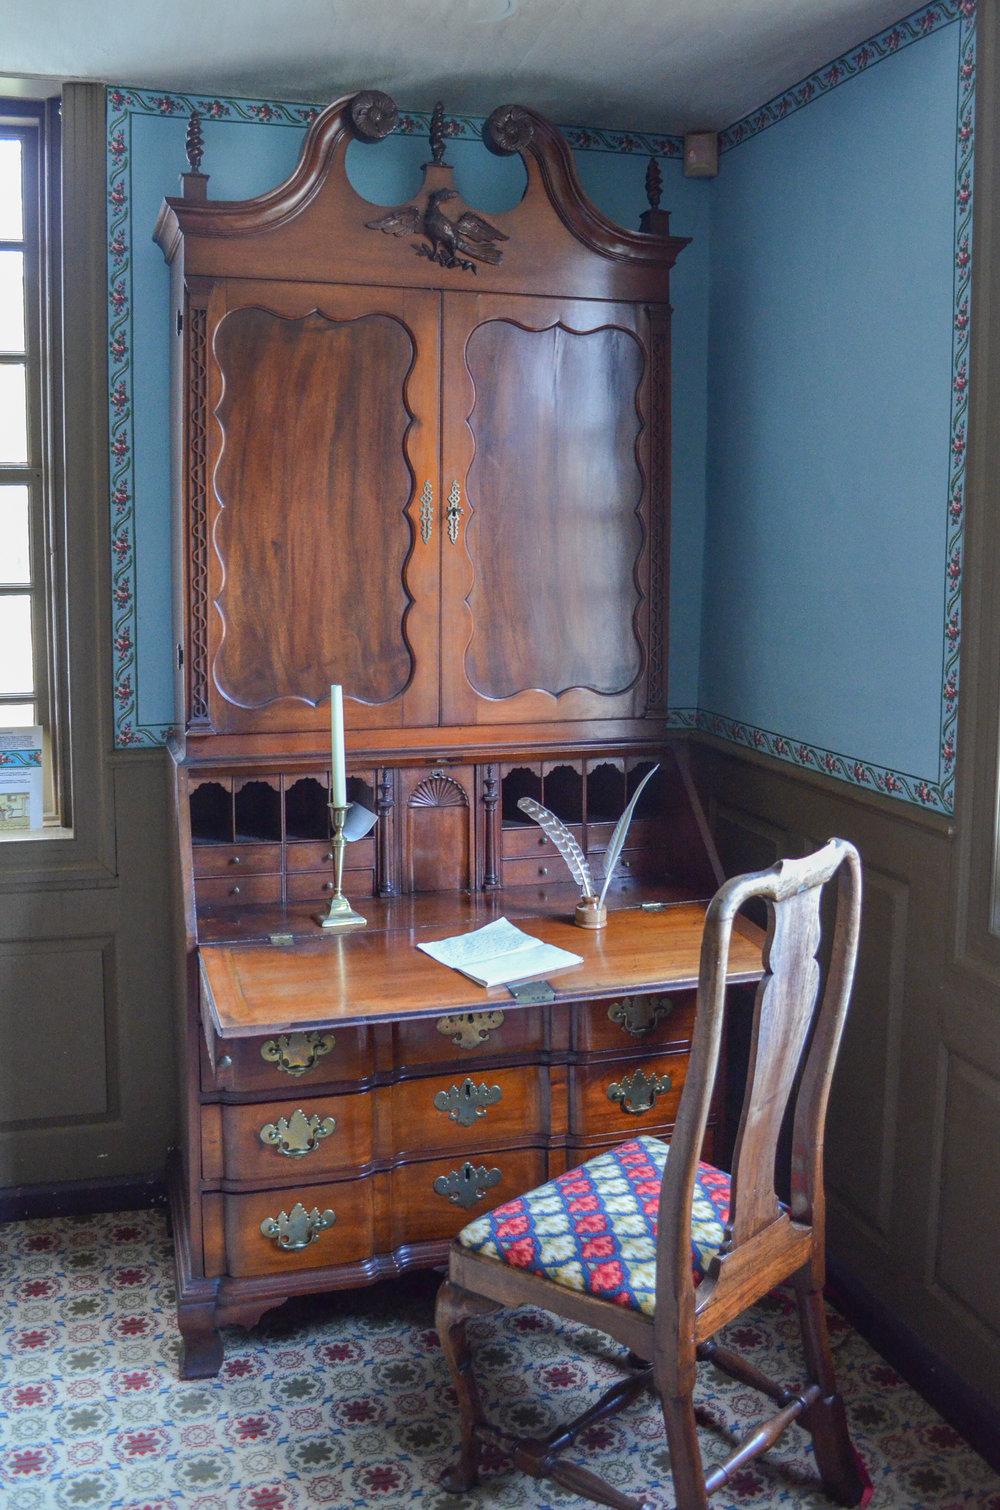 P.Fox edit Desk and Bookcase - K. Valovcin.jpg